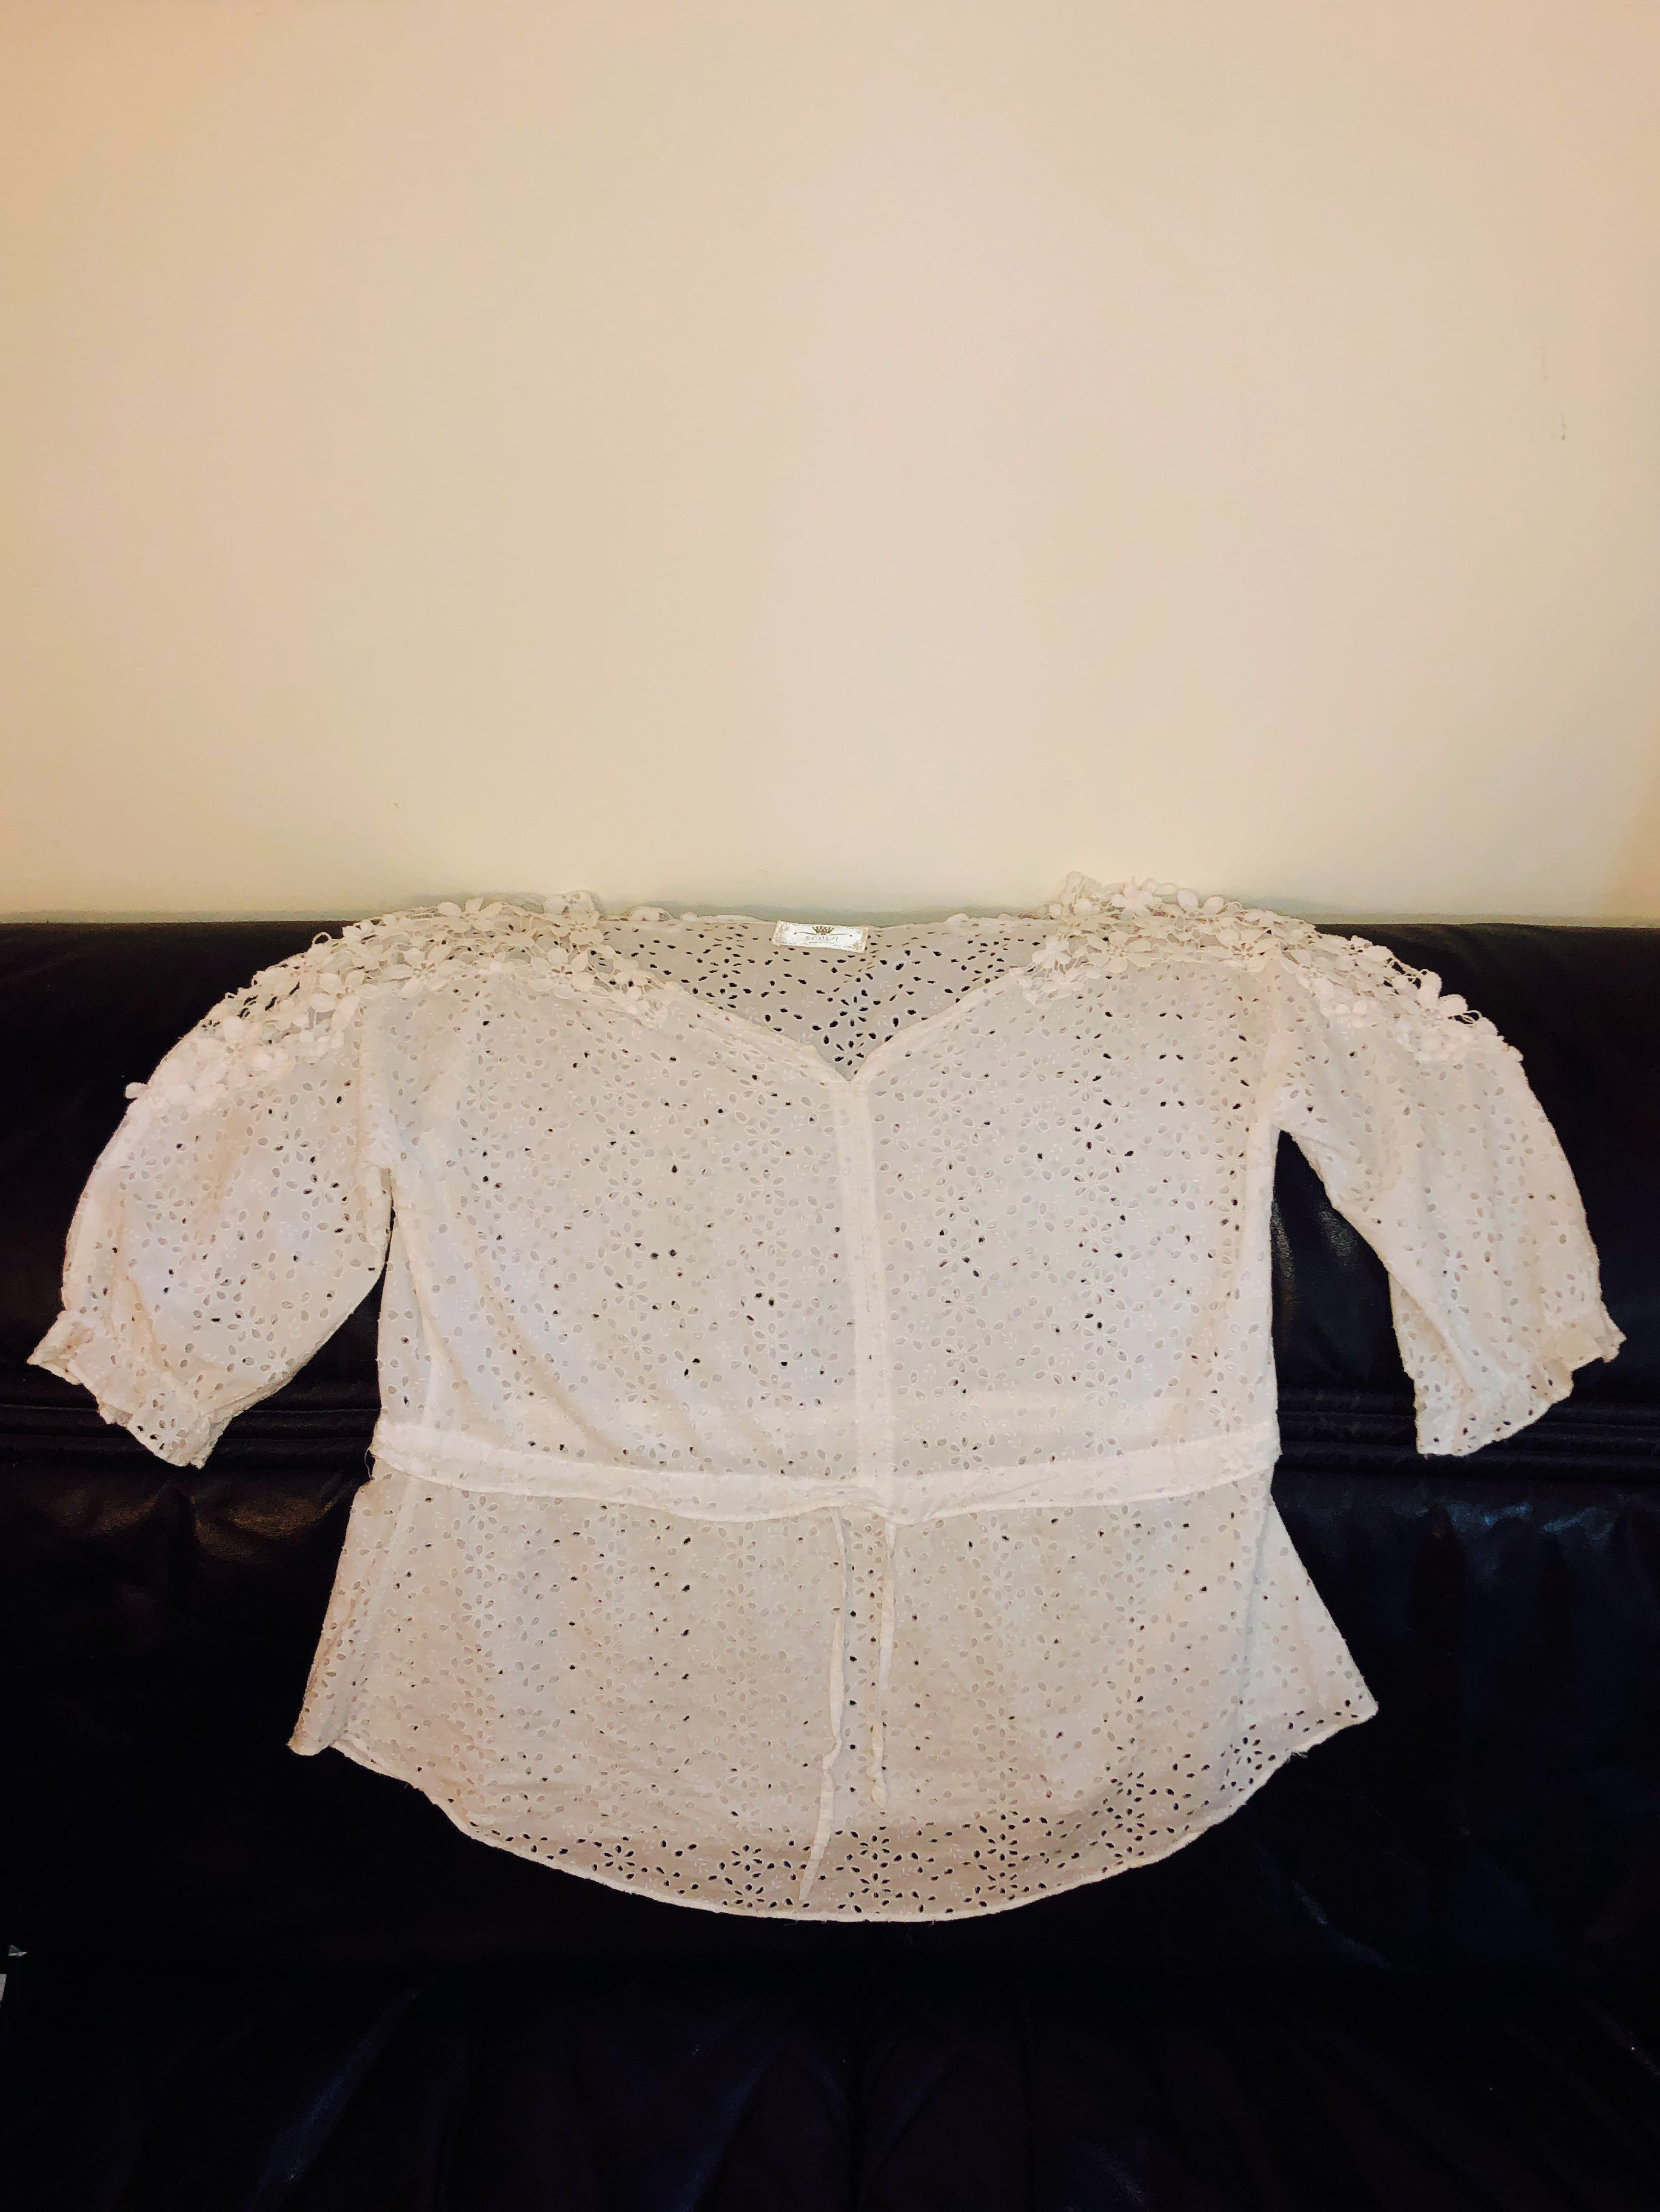 b1d34cdb4da230 Romantic Eyelet White Blouse with Elbow Length Sleeves, Women's ...